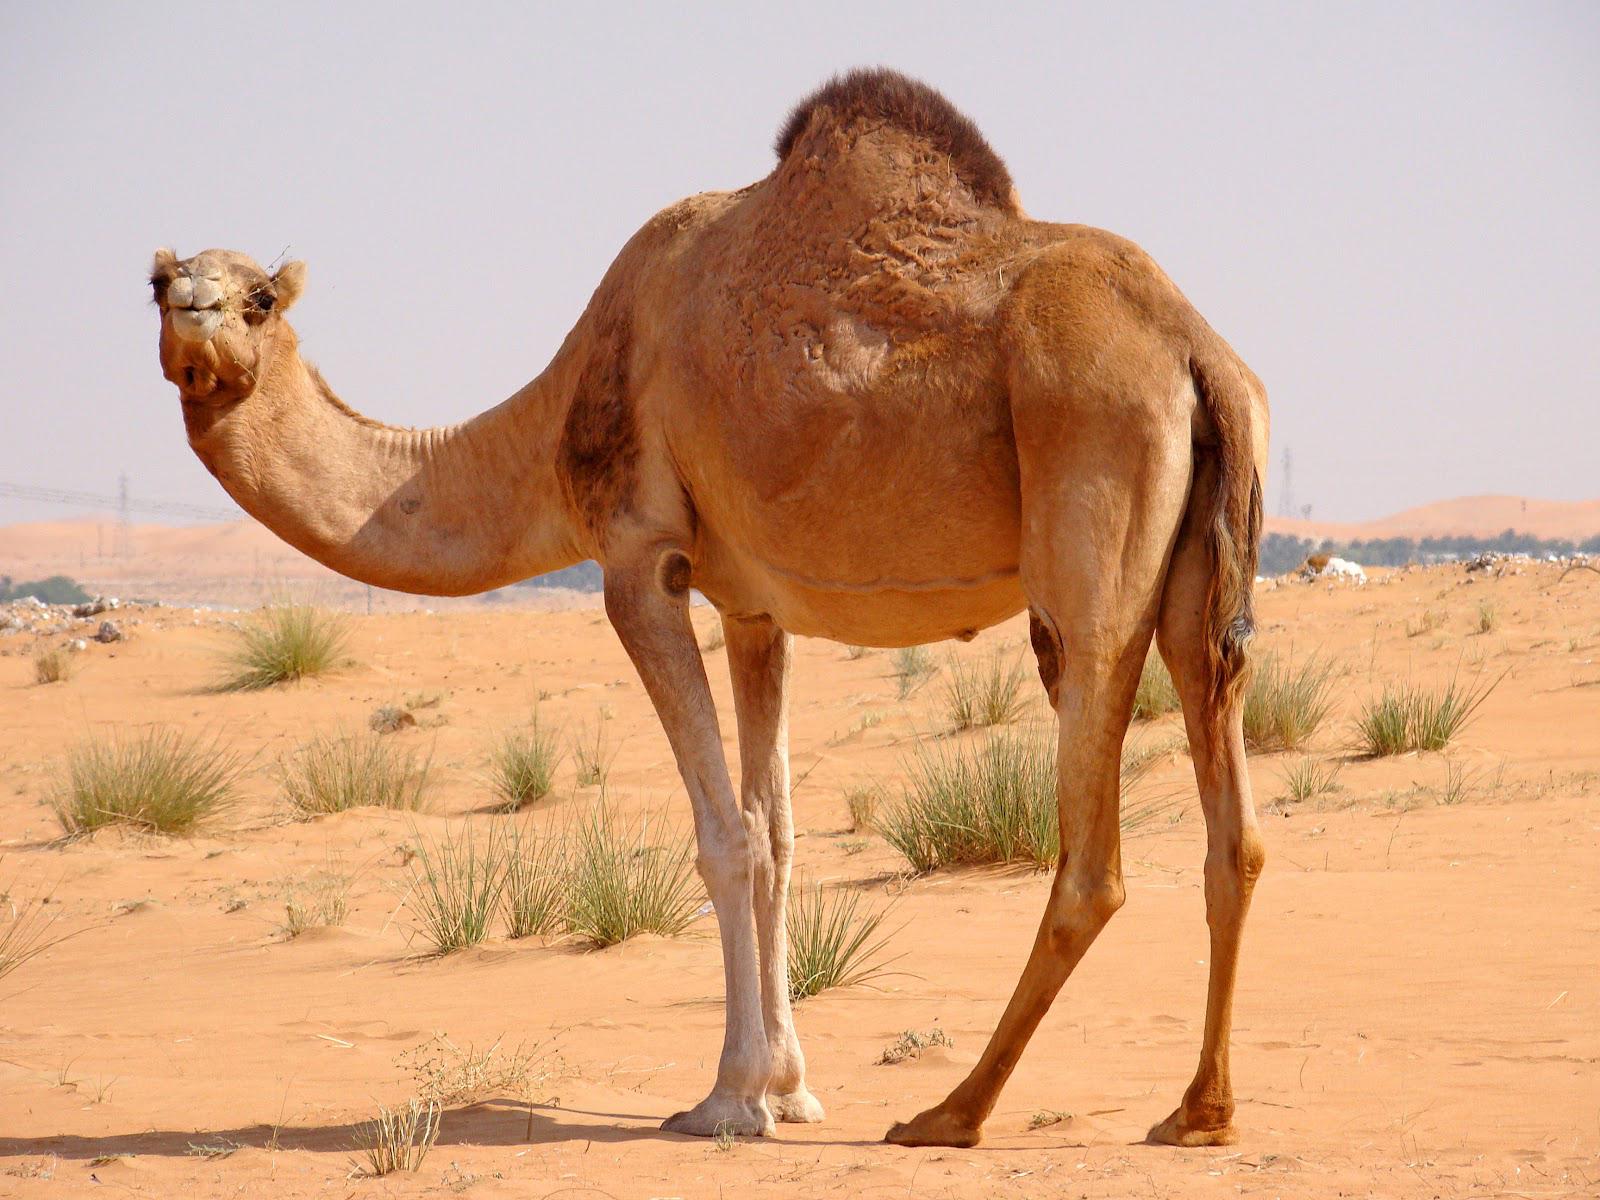 ... Camel · Camel · Camel · Camel